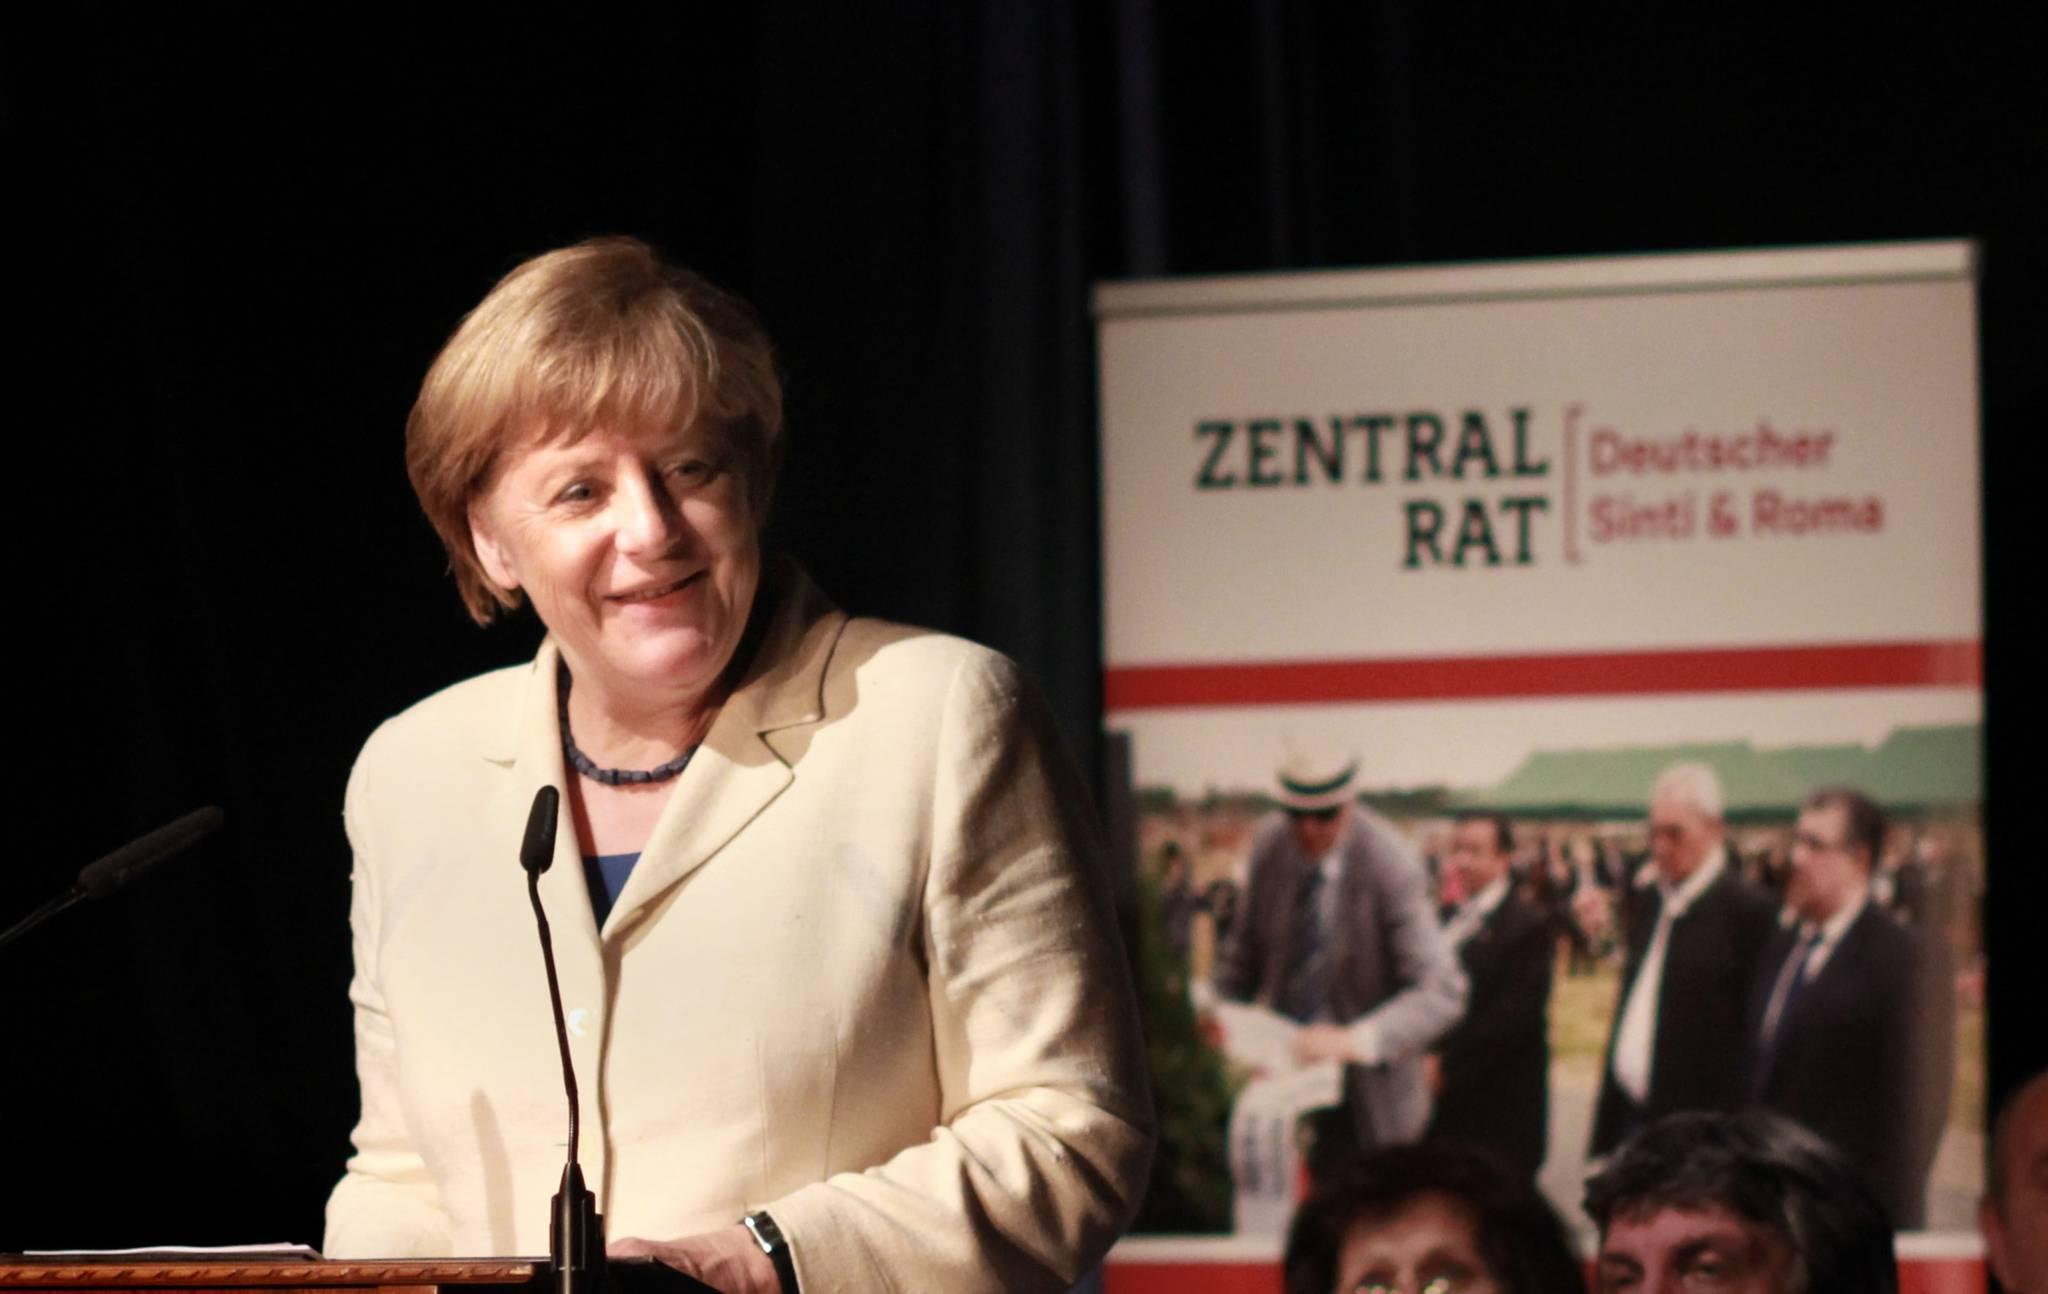 Bundeskanzlerin Dr. Angela Merkel. Foto : Nino Nnihad Pusija